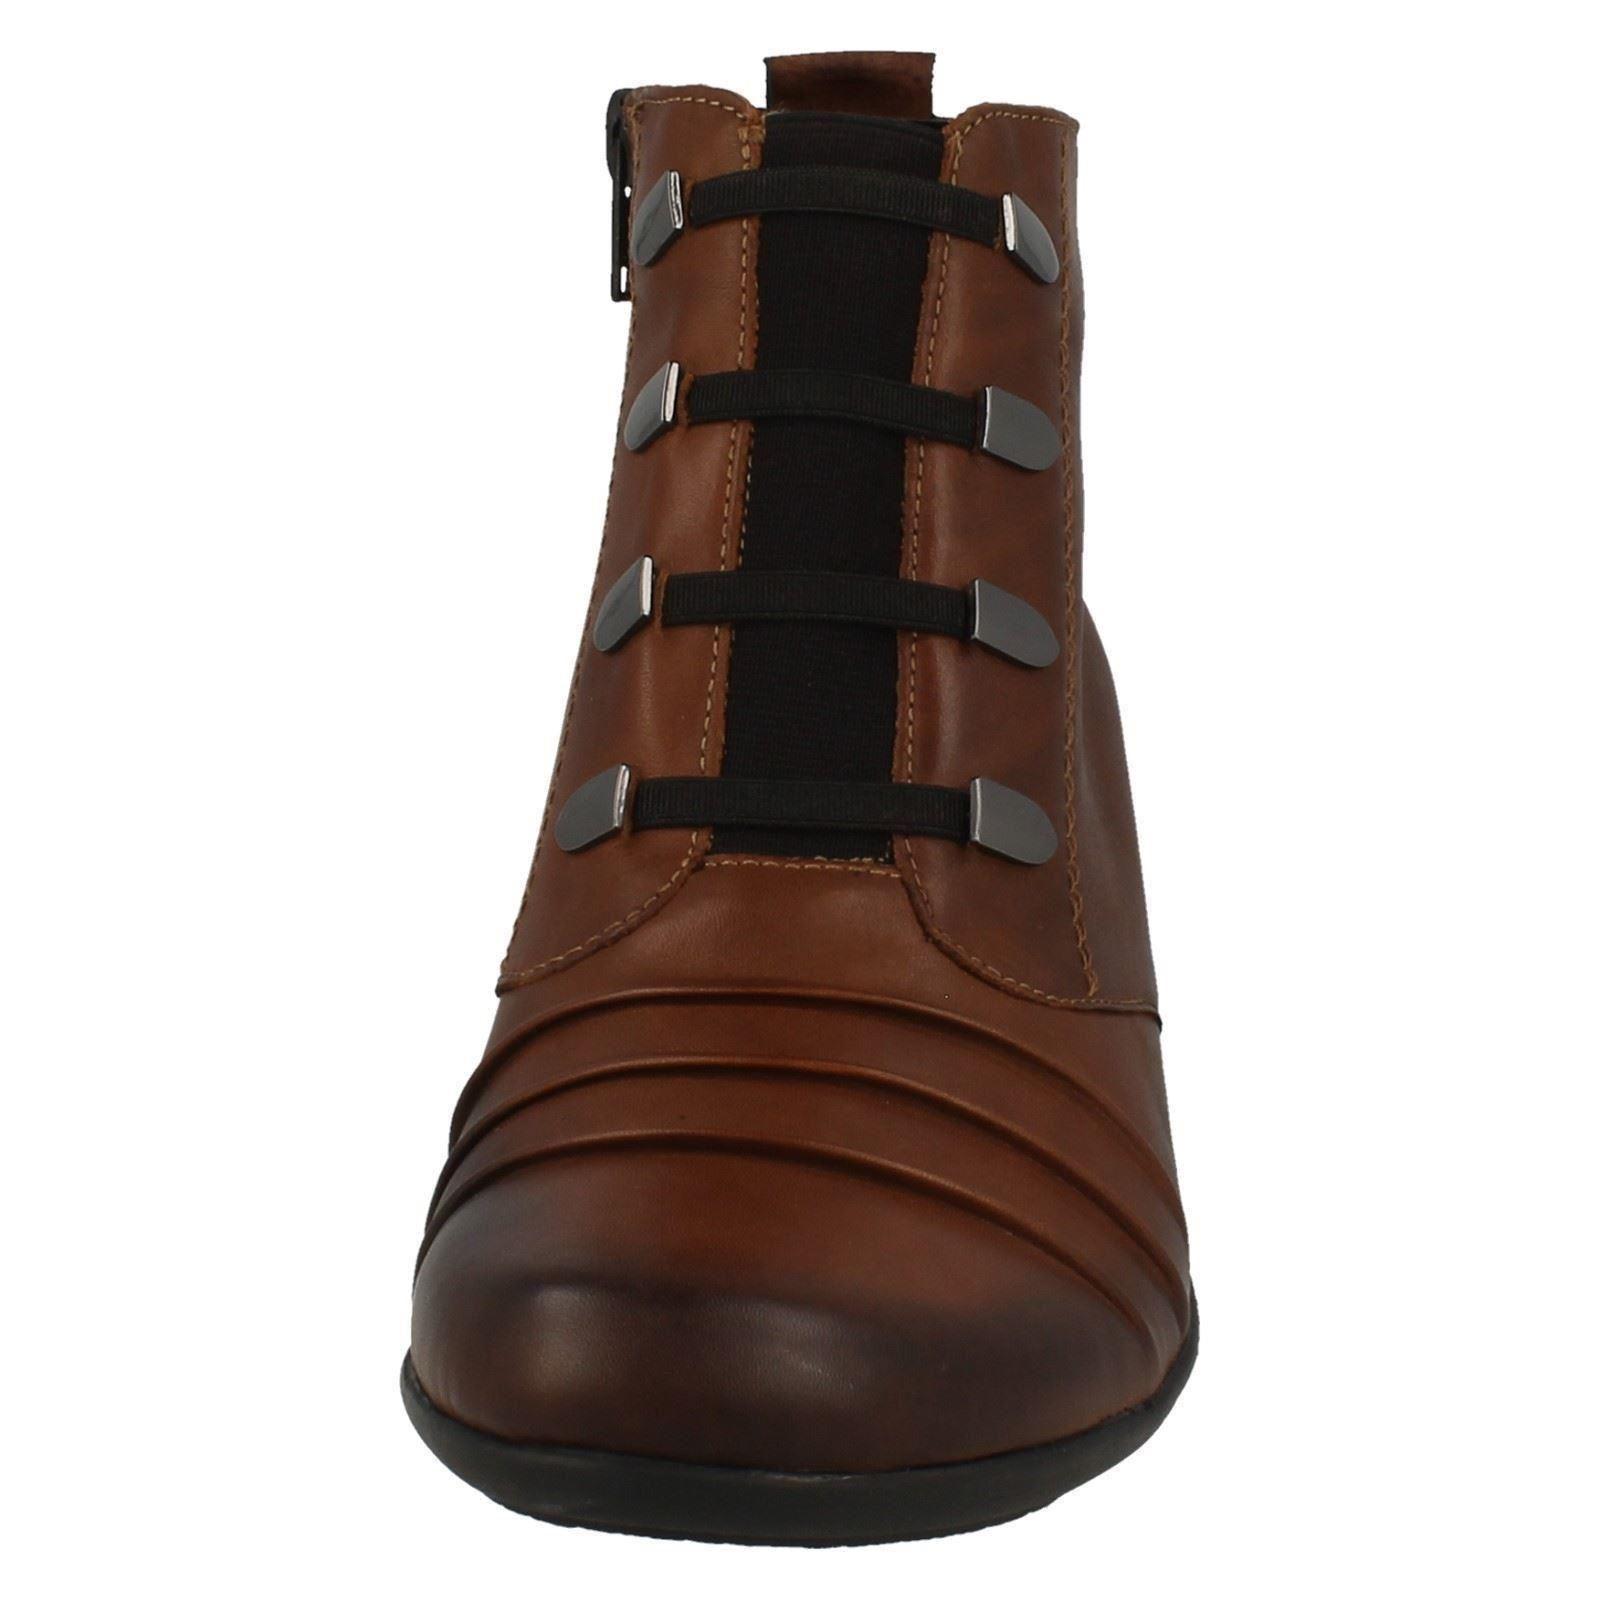 Damas REMONTE botas botas REMONTE al Tobillo Etiqueta D7381 81999d